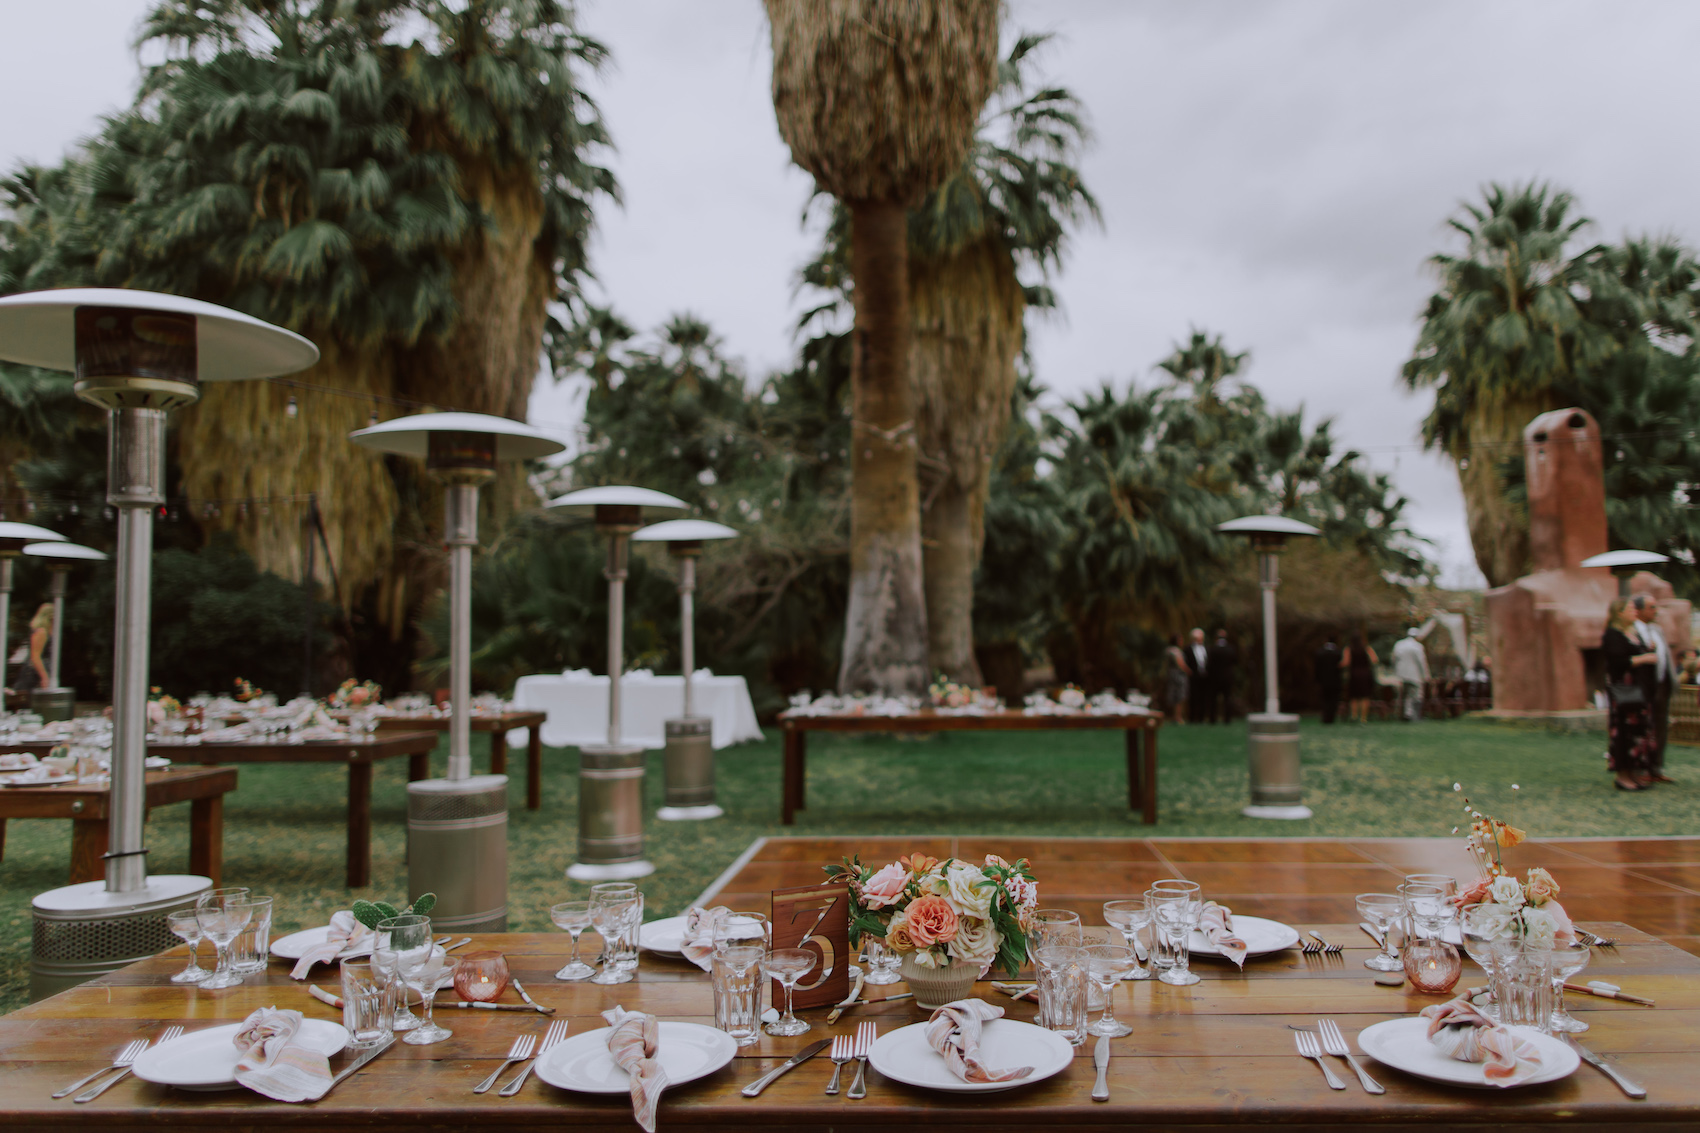 29-Palms-Inn-Joshua-Tree-Jewish-Wedding-H+M-36.jpg